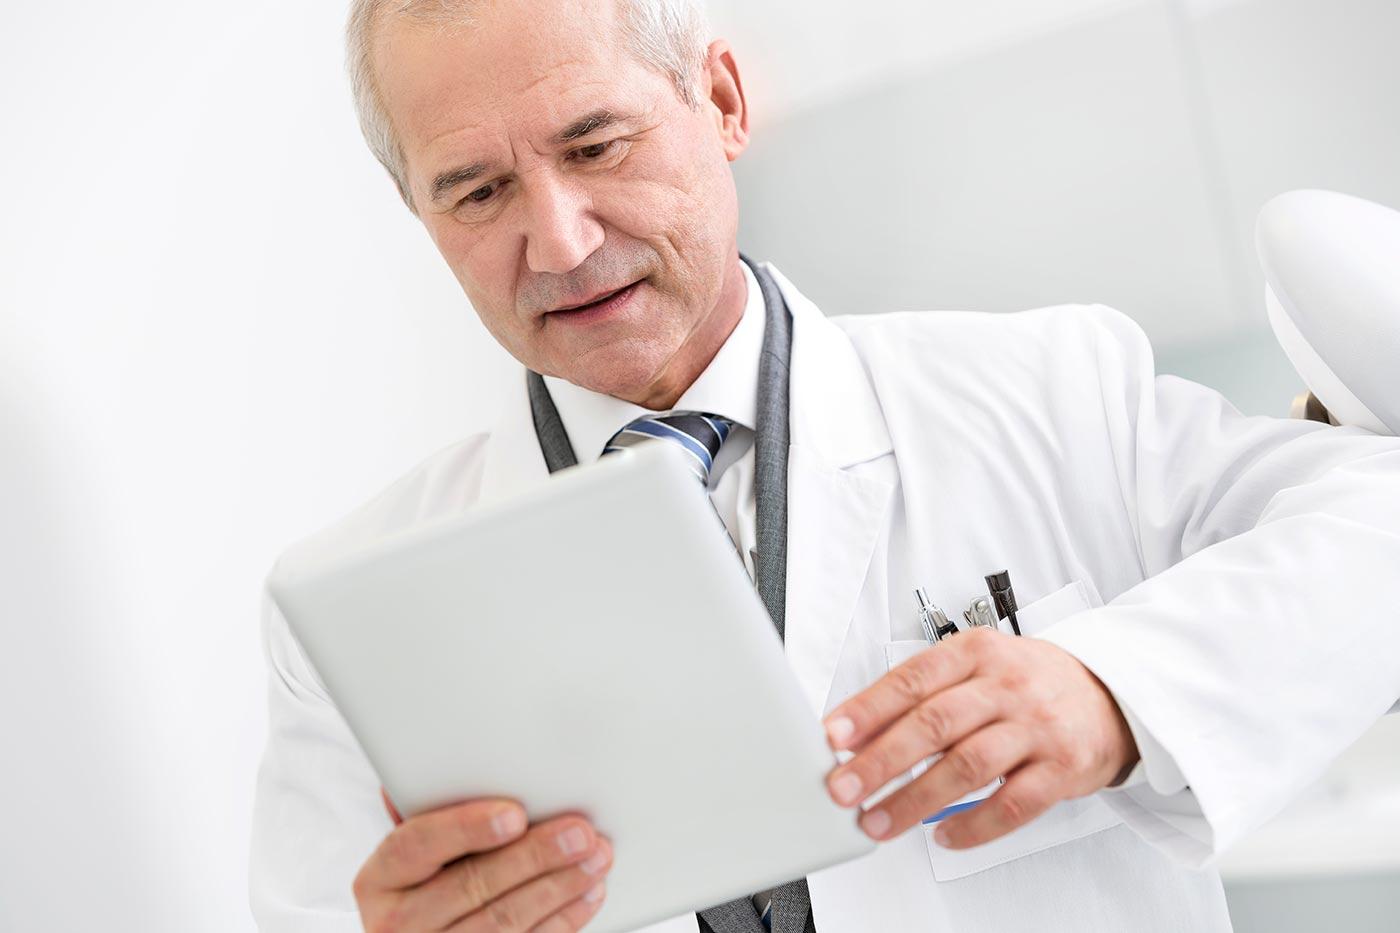 Zahnarzt mit Tablet-Computer